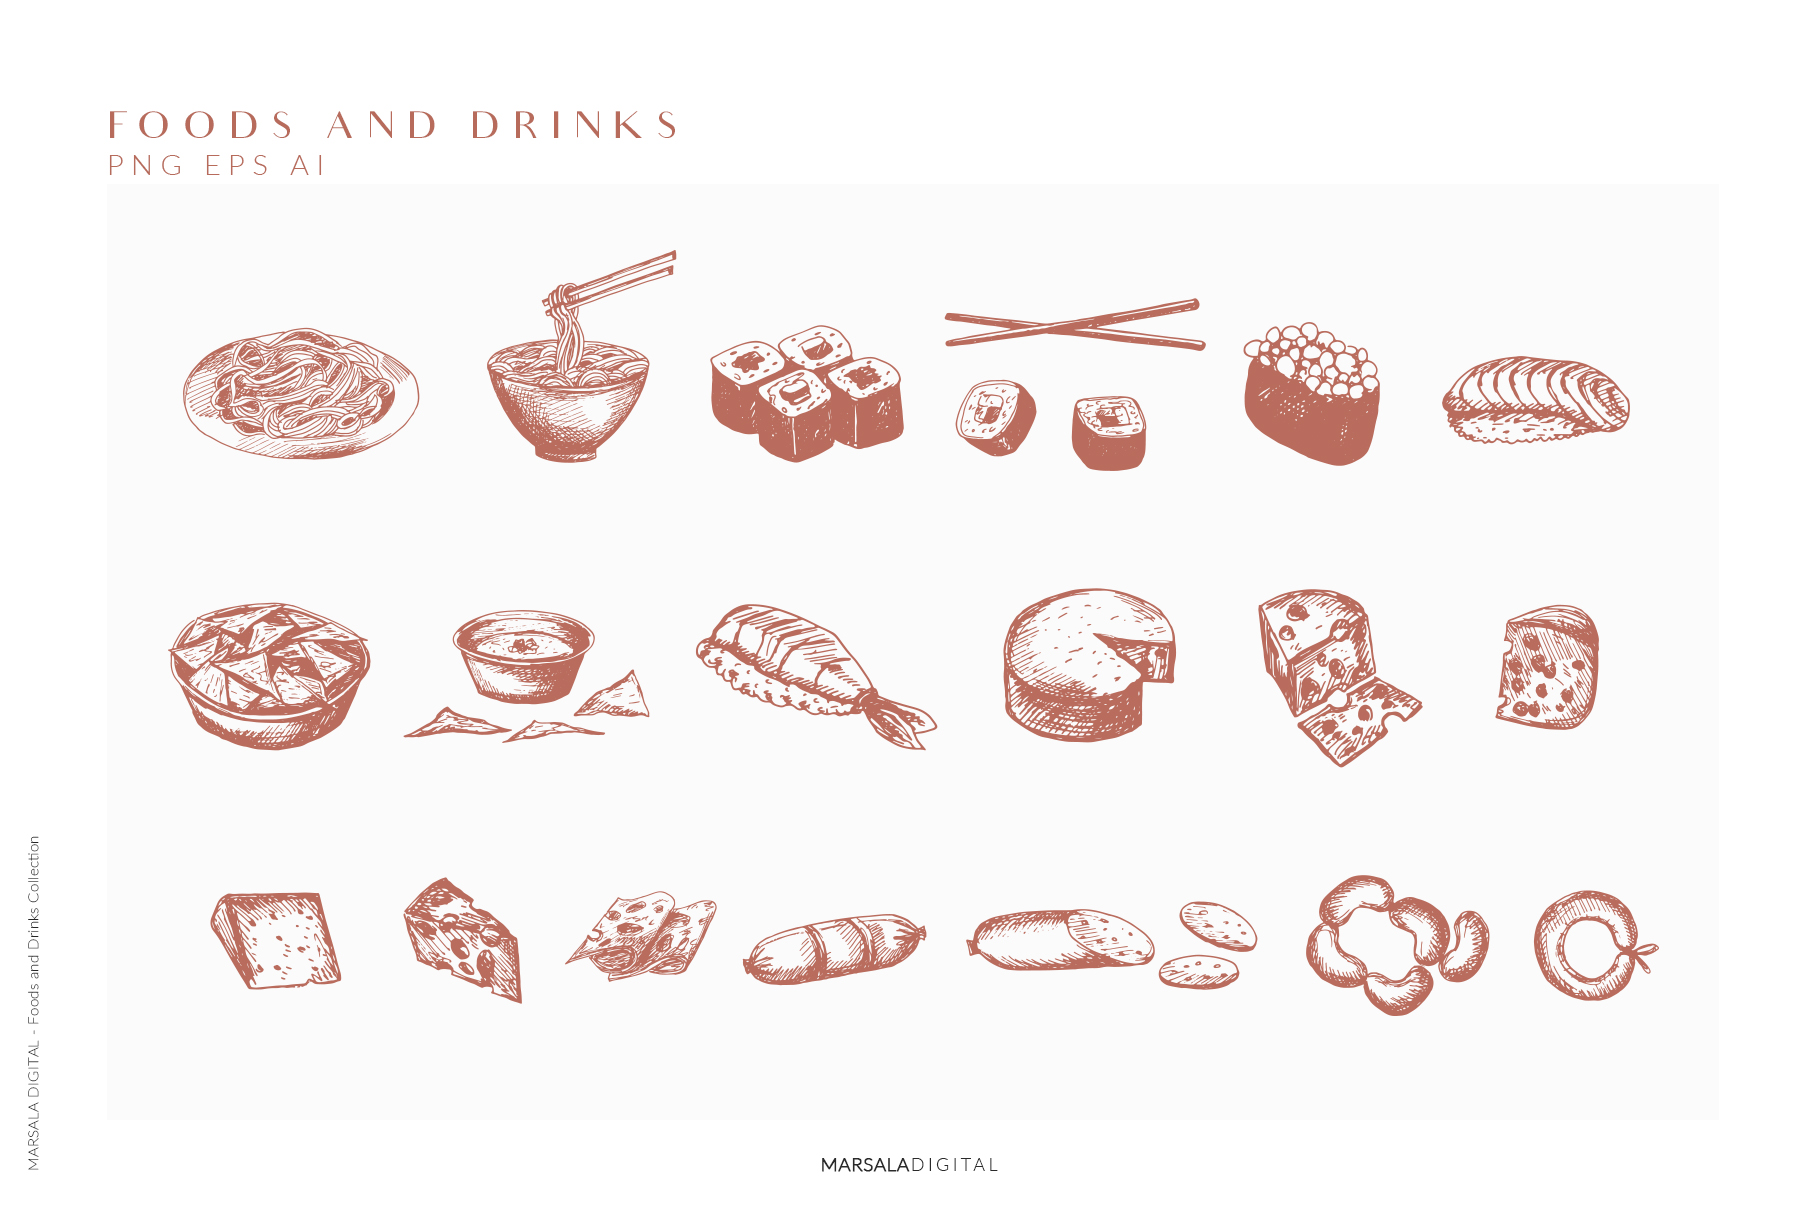 Foods & Drinks Logo Elements Handrawn Graphics example image 6